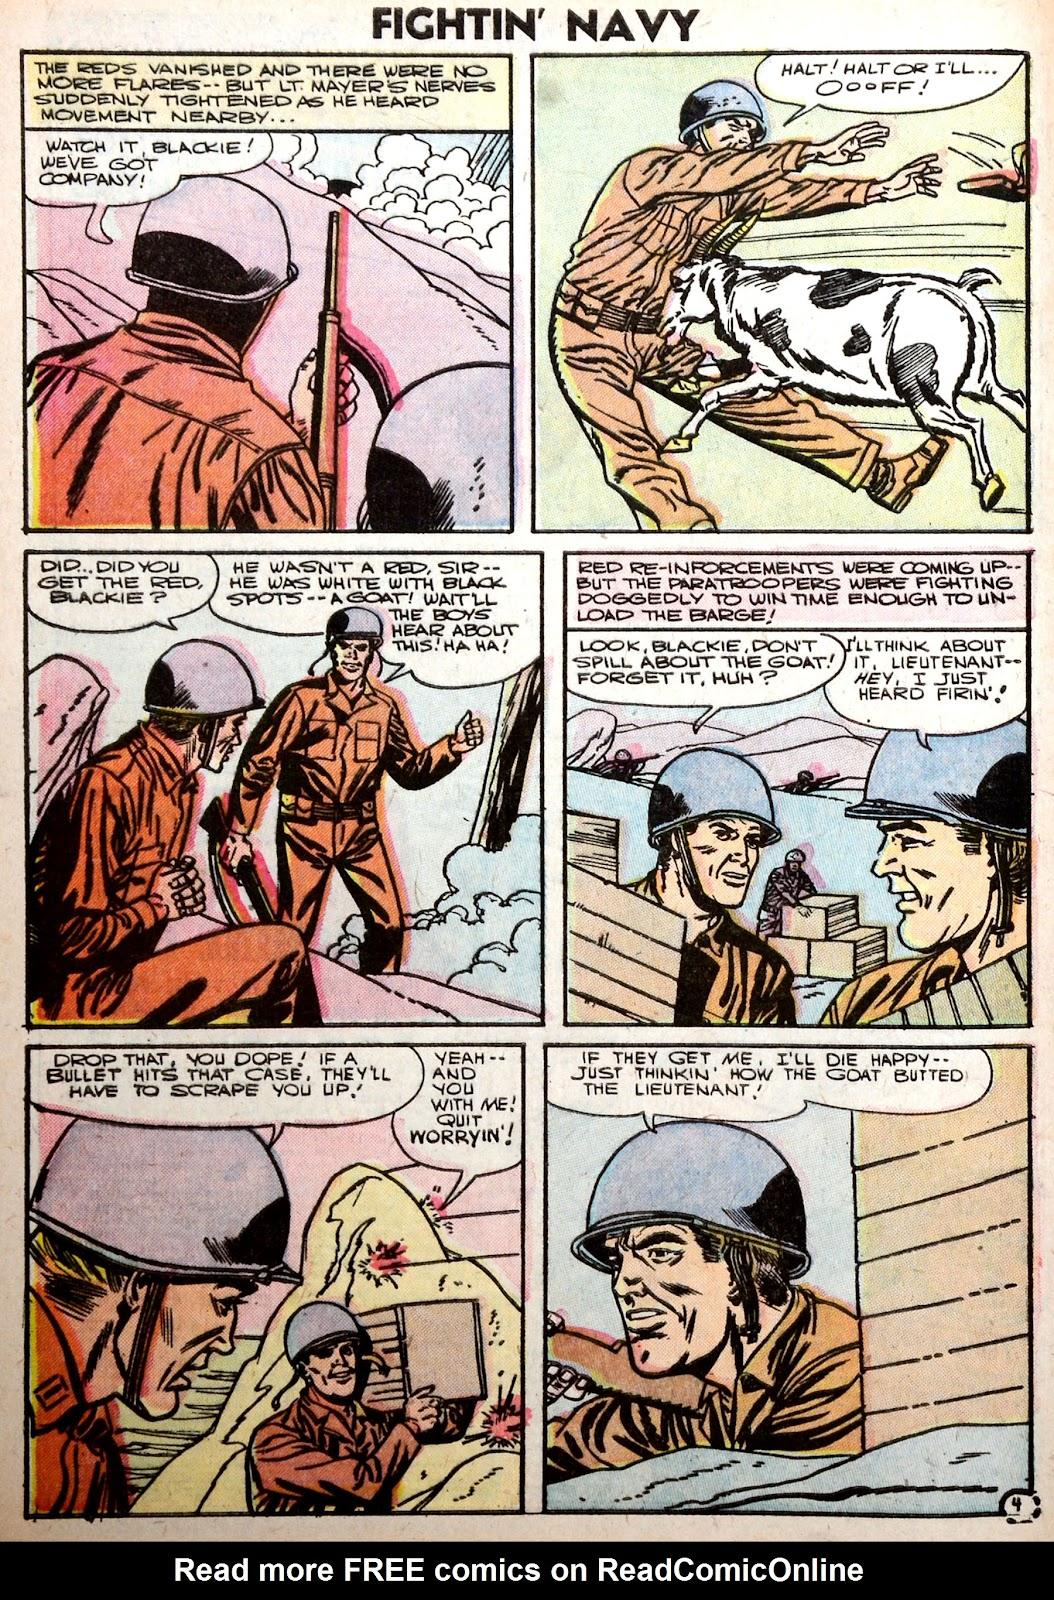 Read online Fightin' Navy comic -  Issue #75 - 32